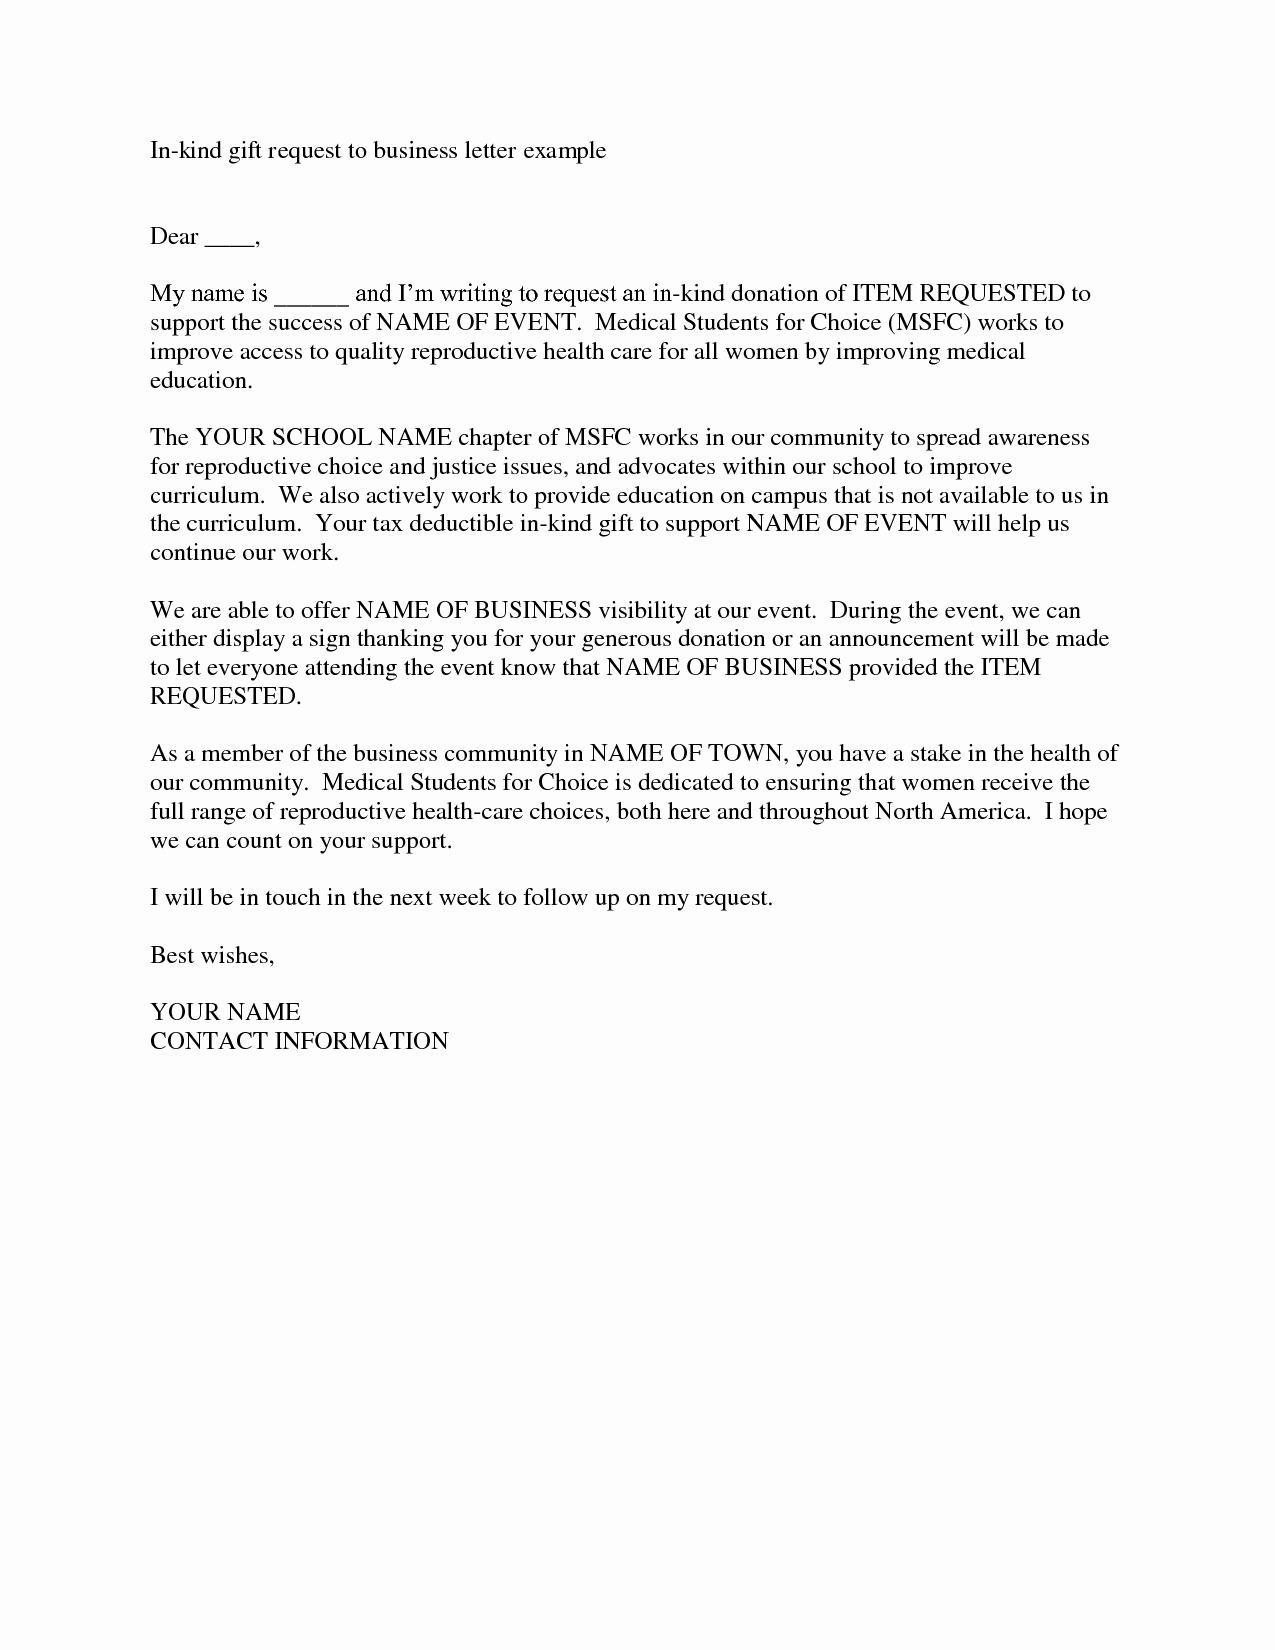 Donation Request Letter Template Elegant Fundraising Made Effortless with 13 Donation Request Letters